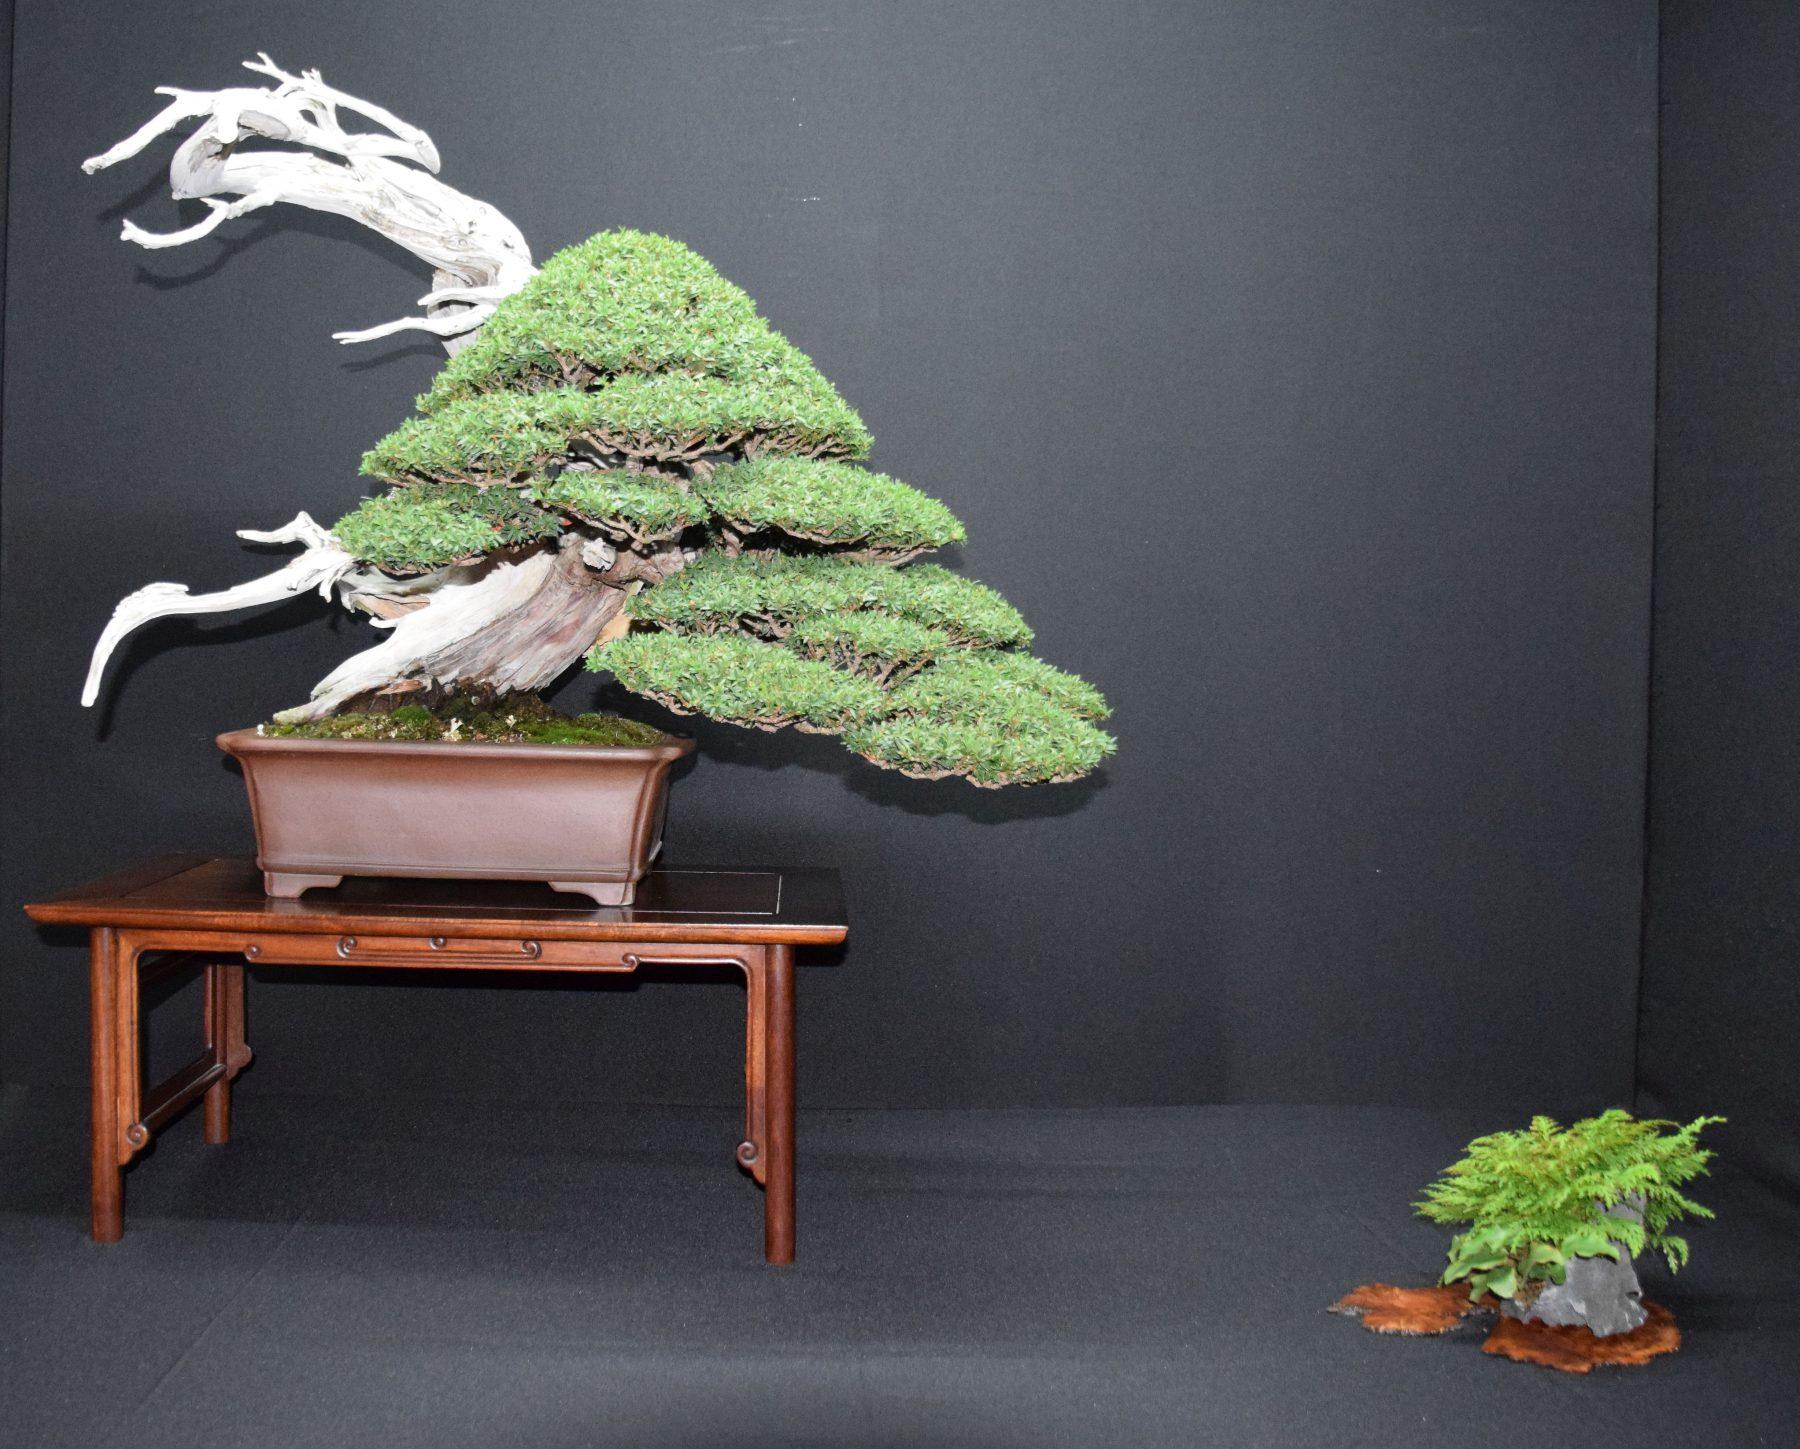 bonsai-museum-luis-vallejo-029